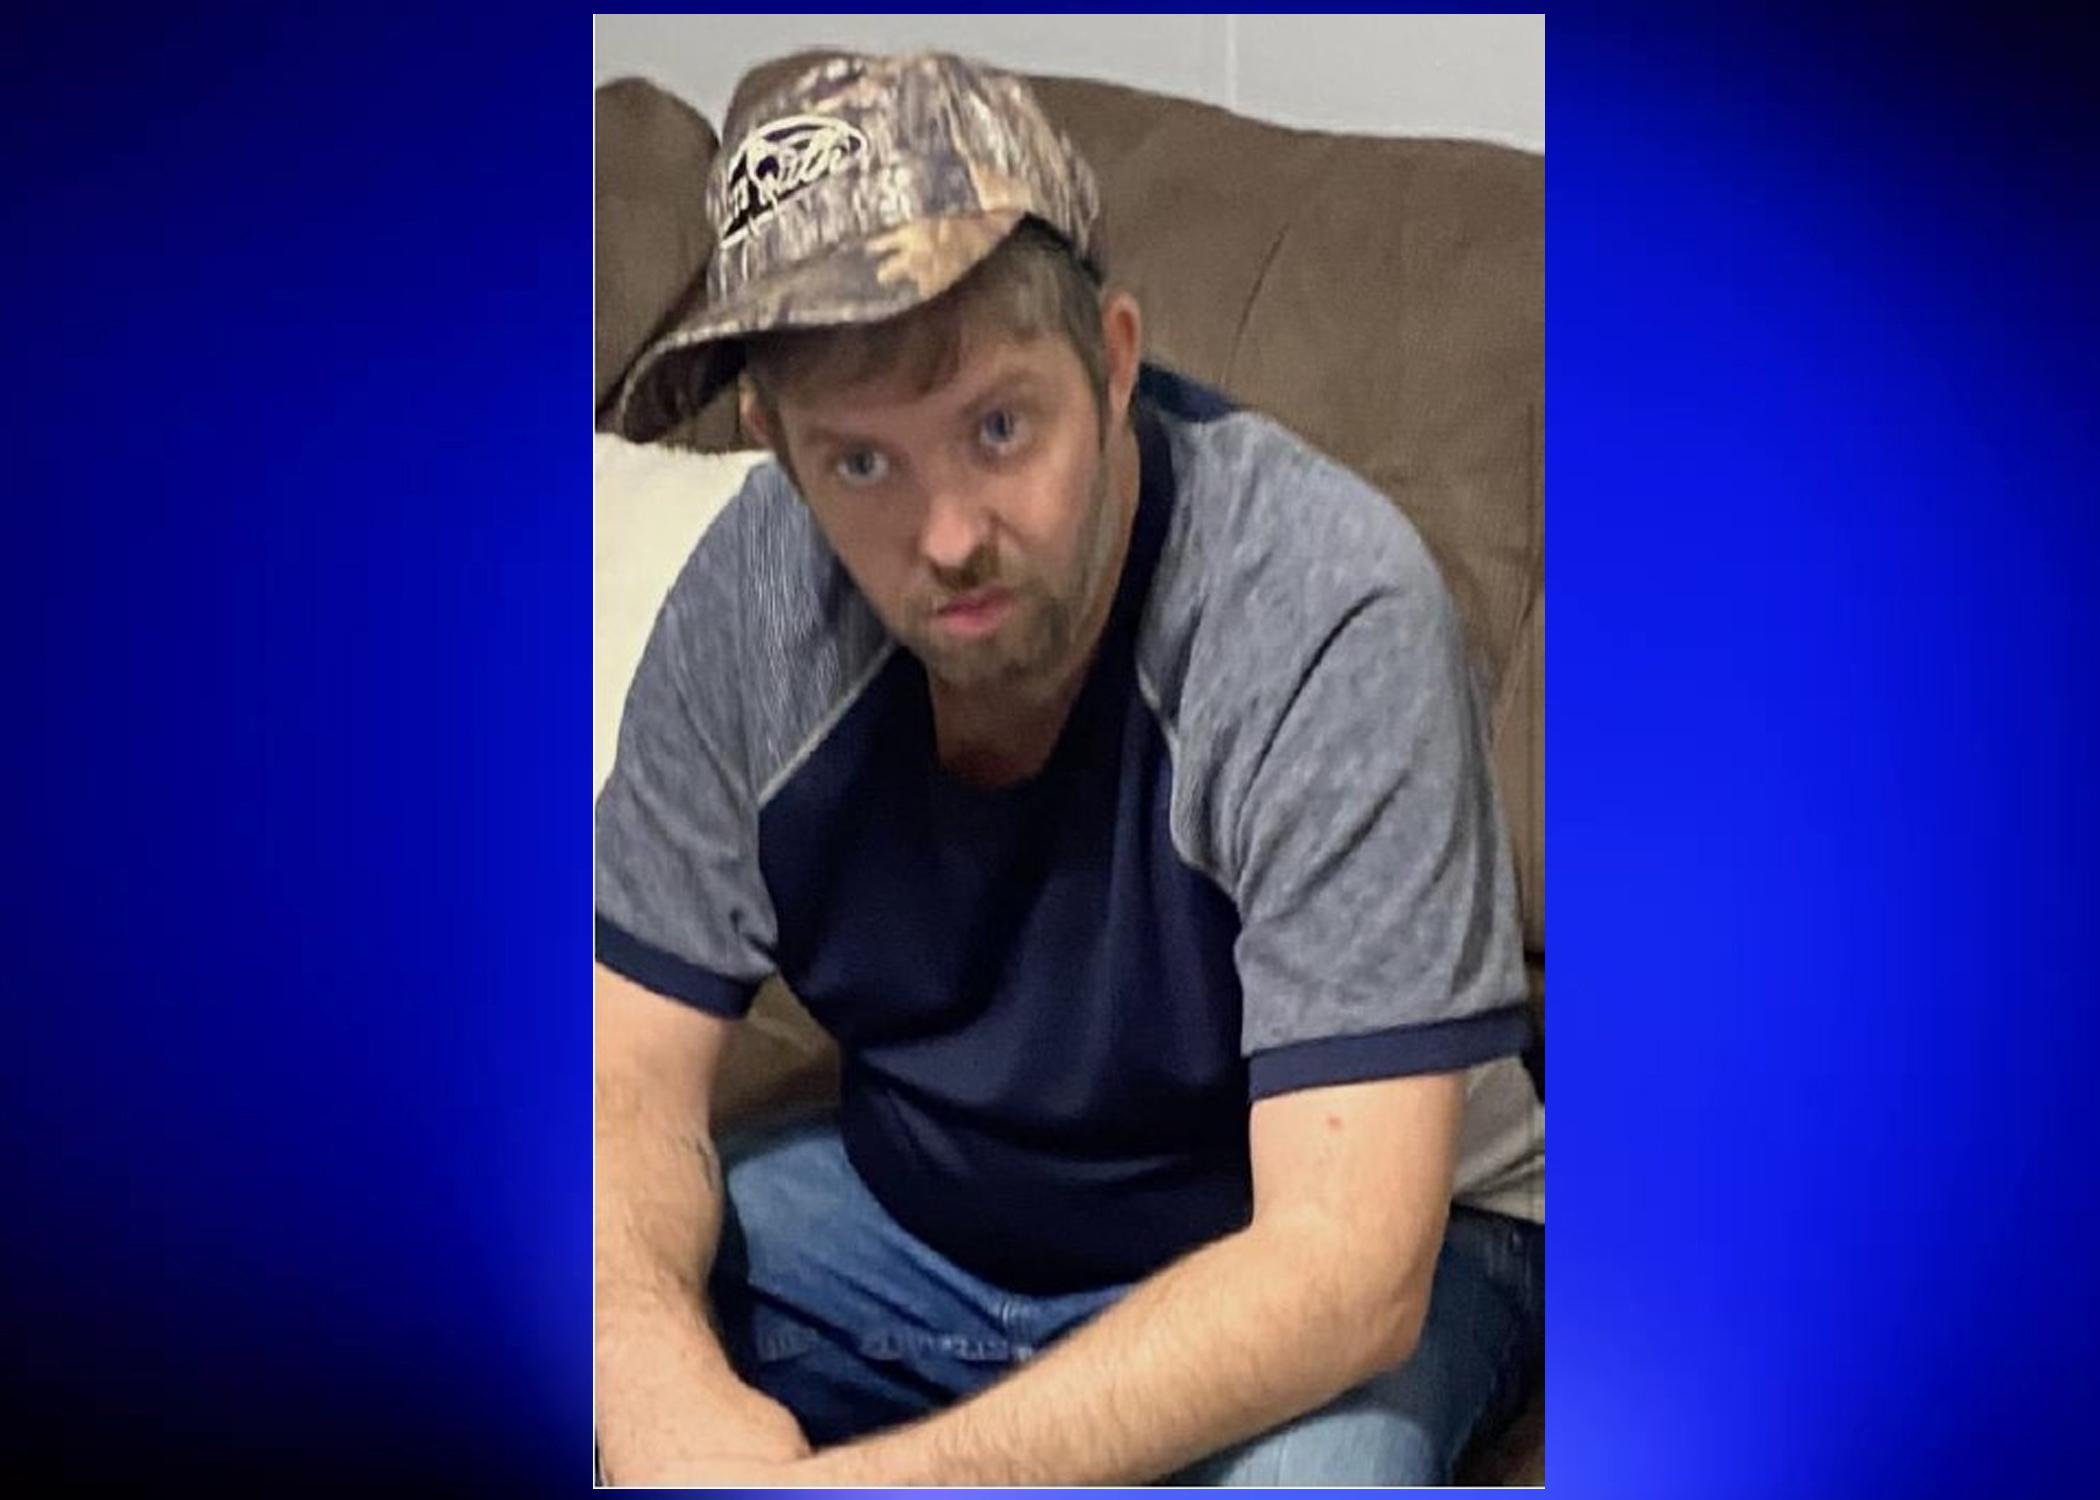 Critical Missing Person investigation underway in Birmingham